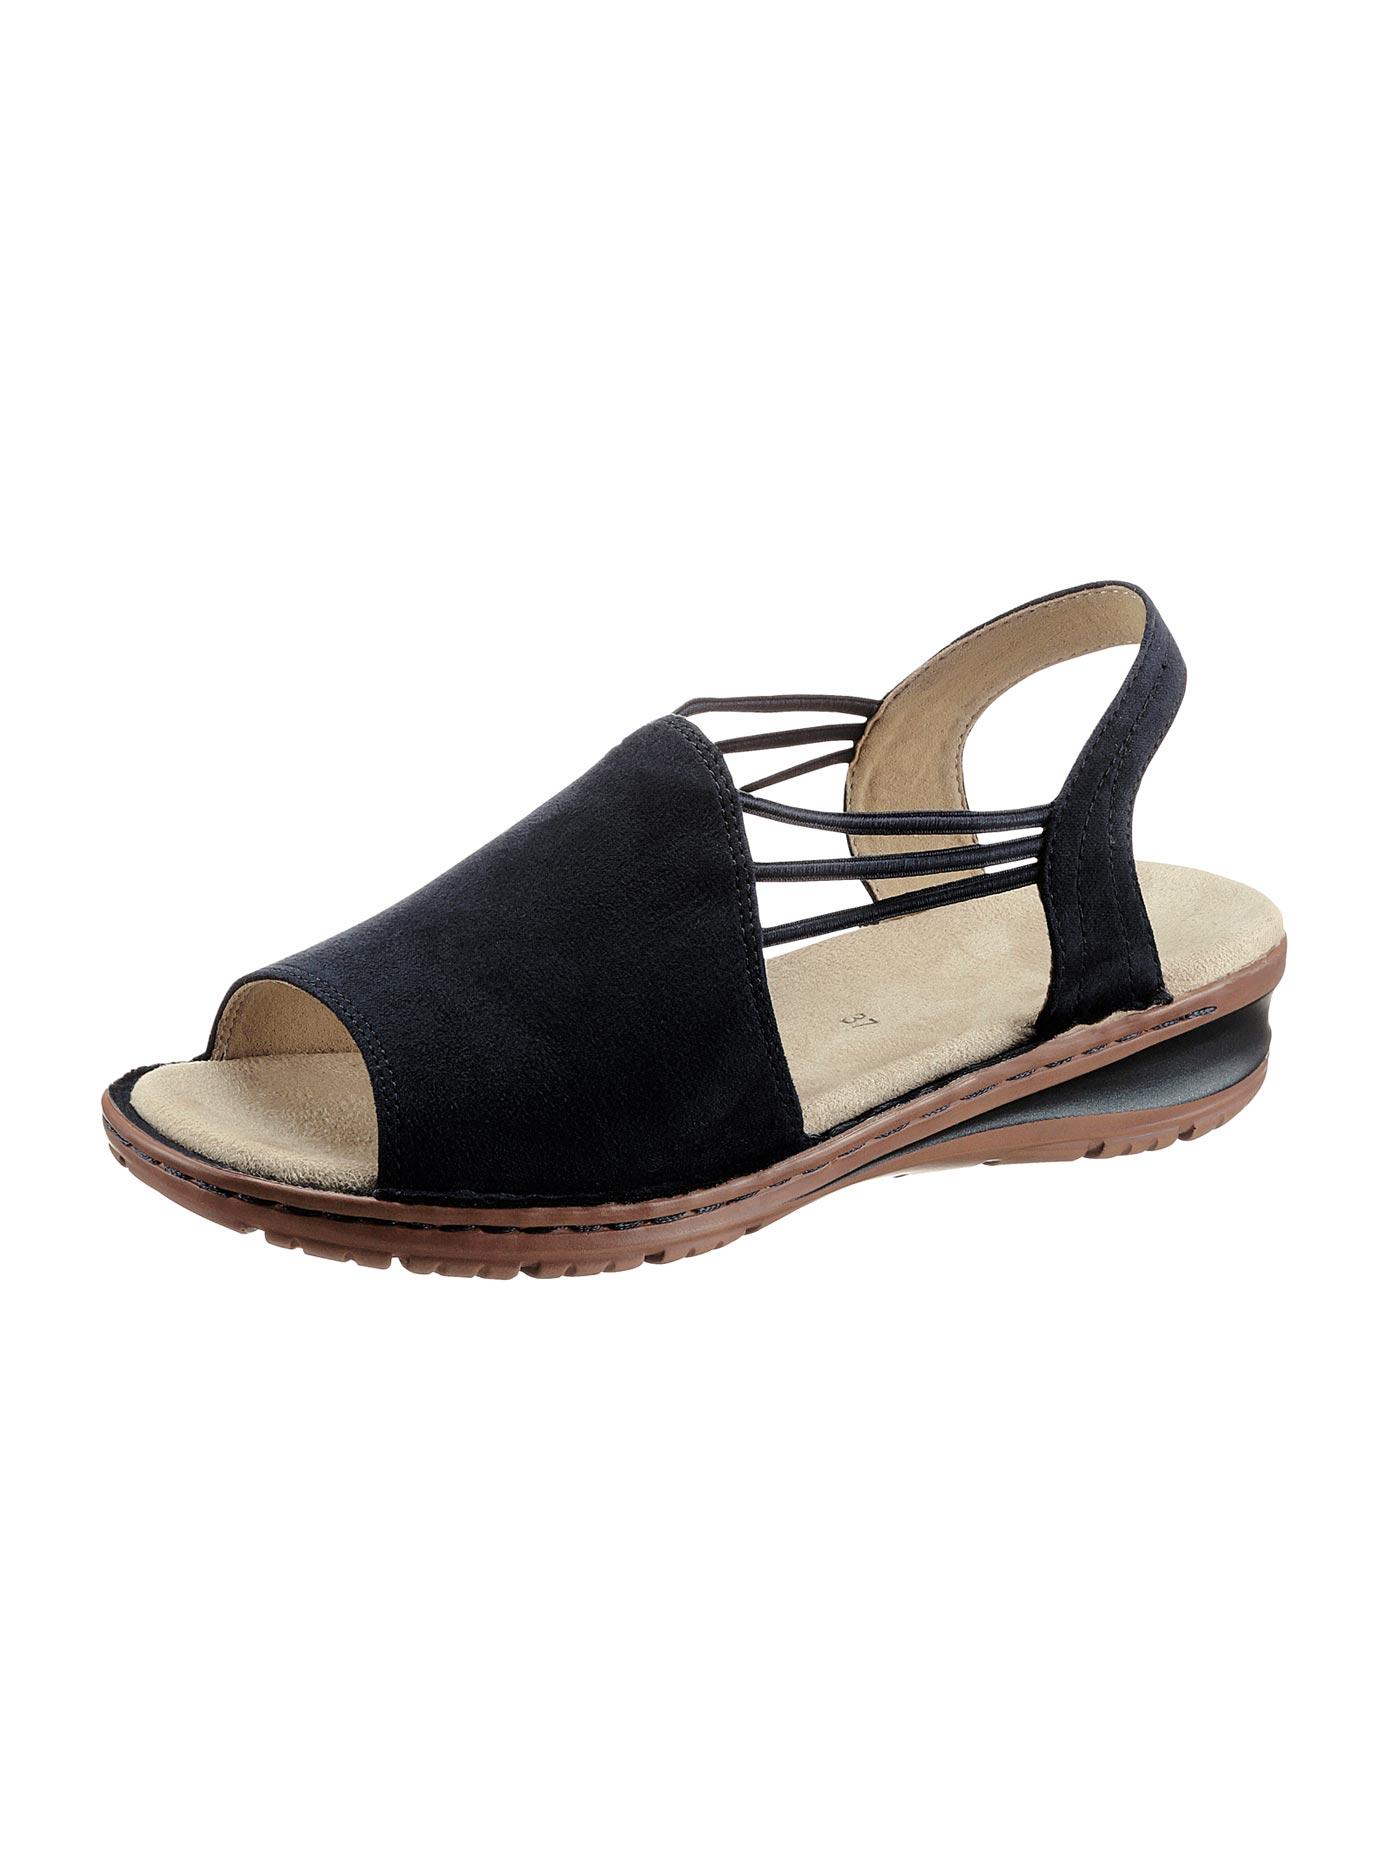 Ara Sandalette blau Damen Sandaletten Sandalen